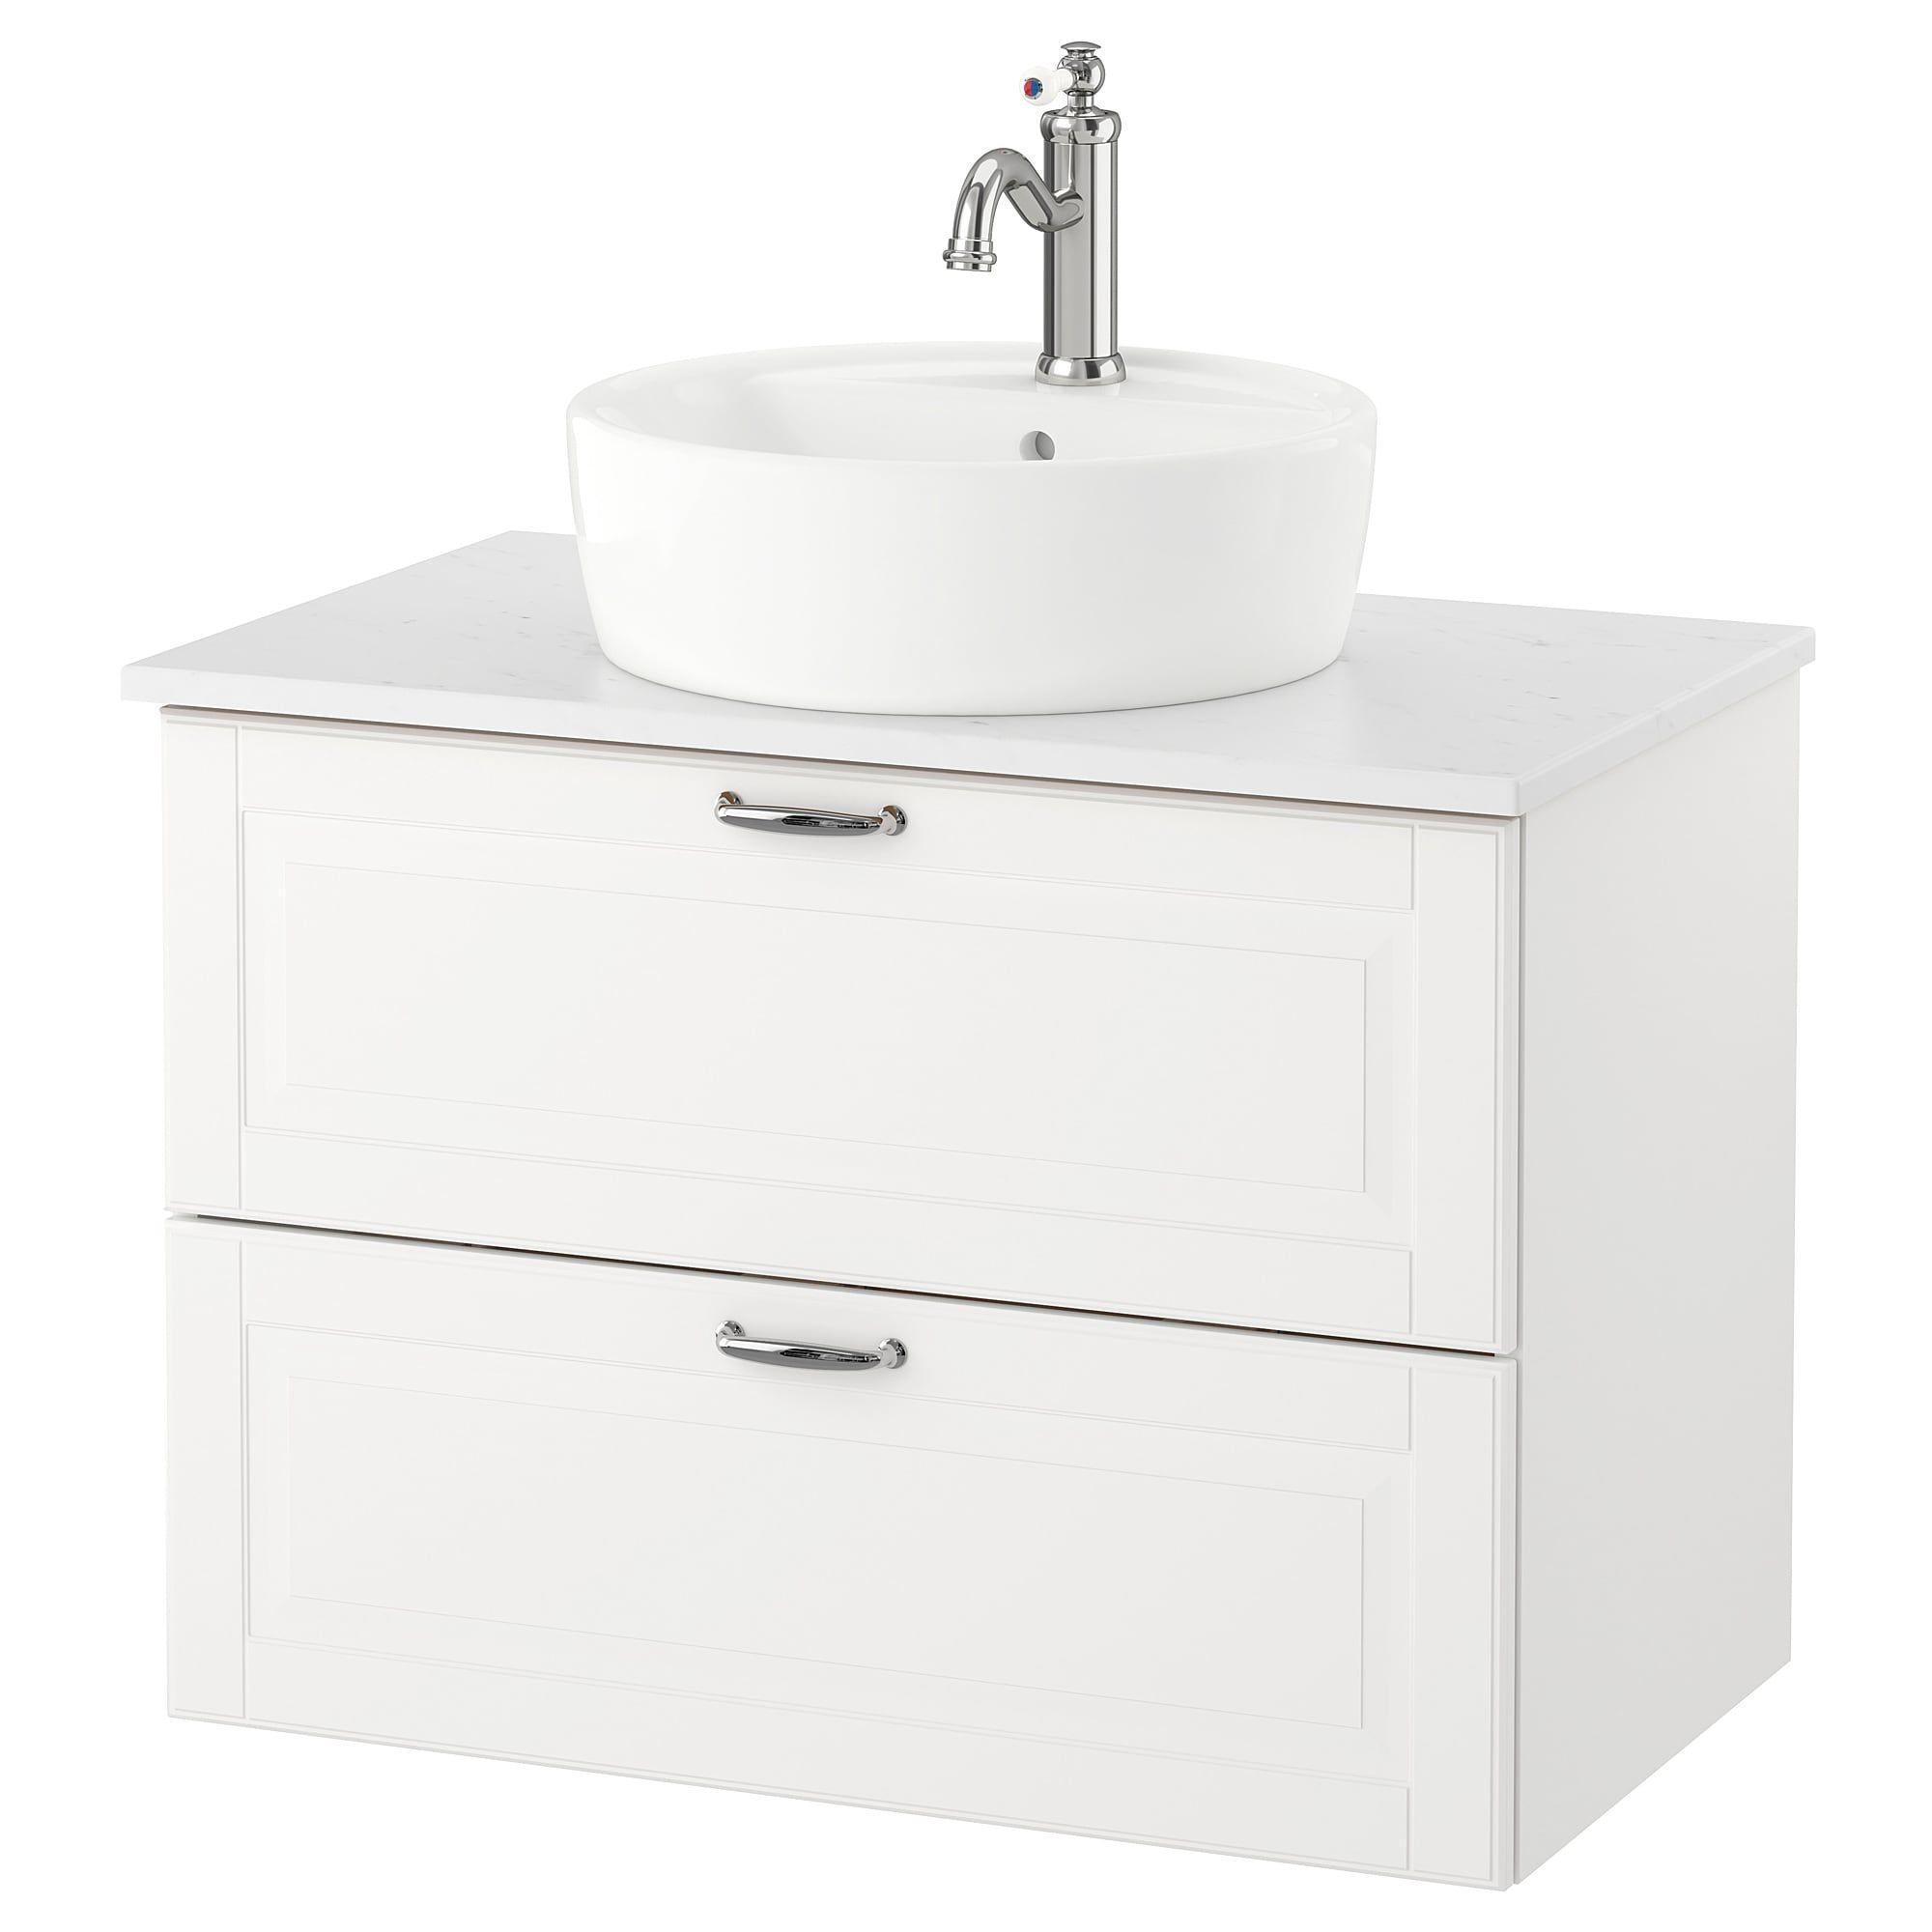 Us Furniture And Home Furnishings Ikea Vanity Small Bathtub